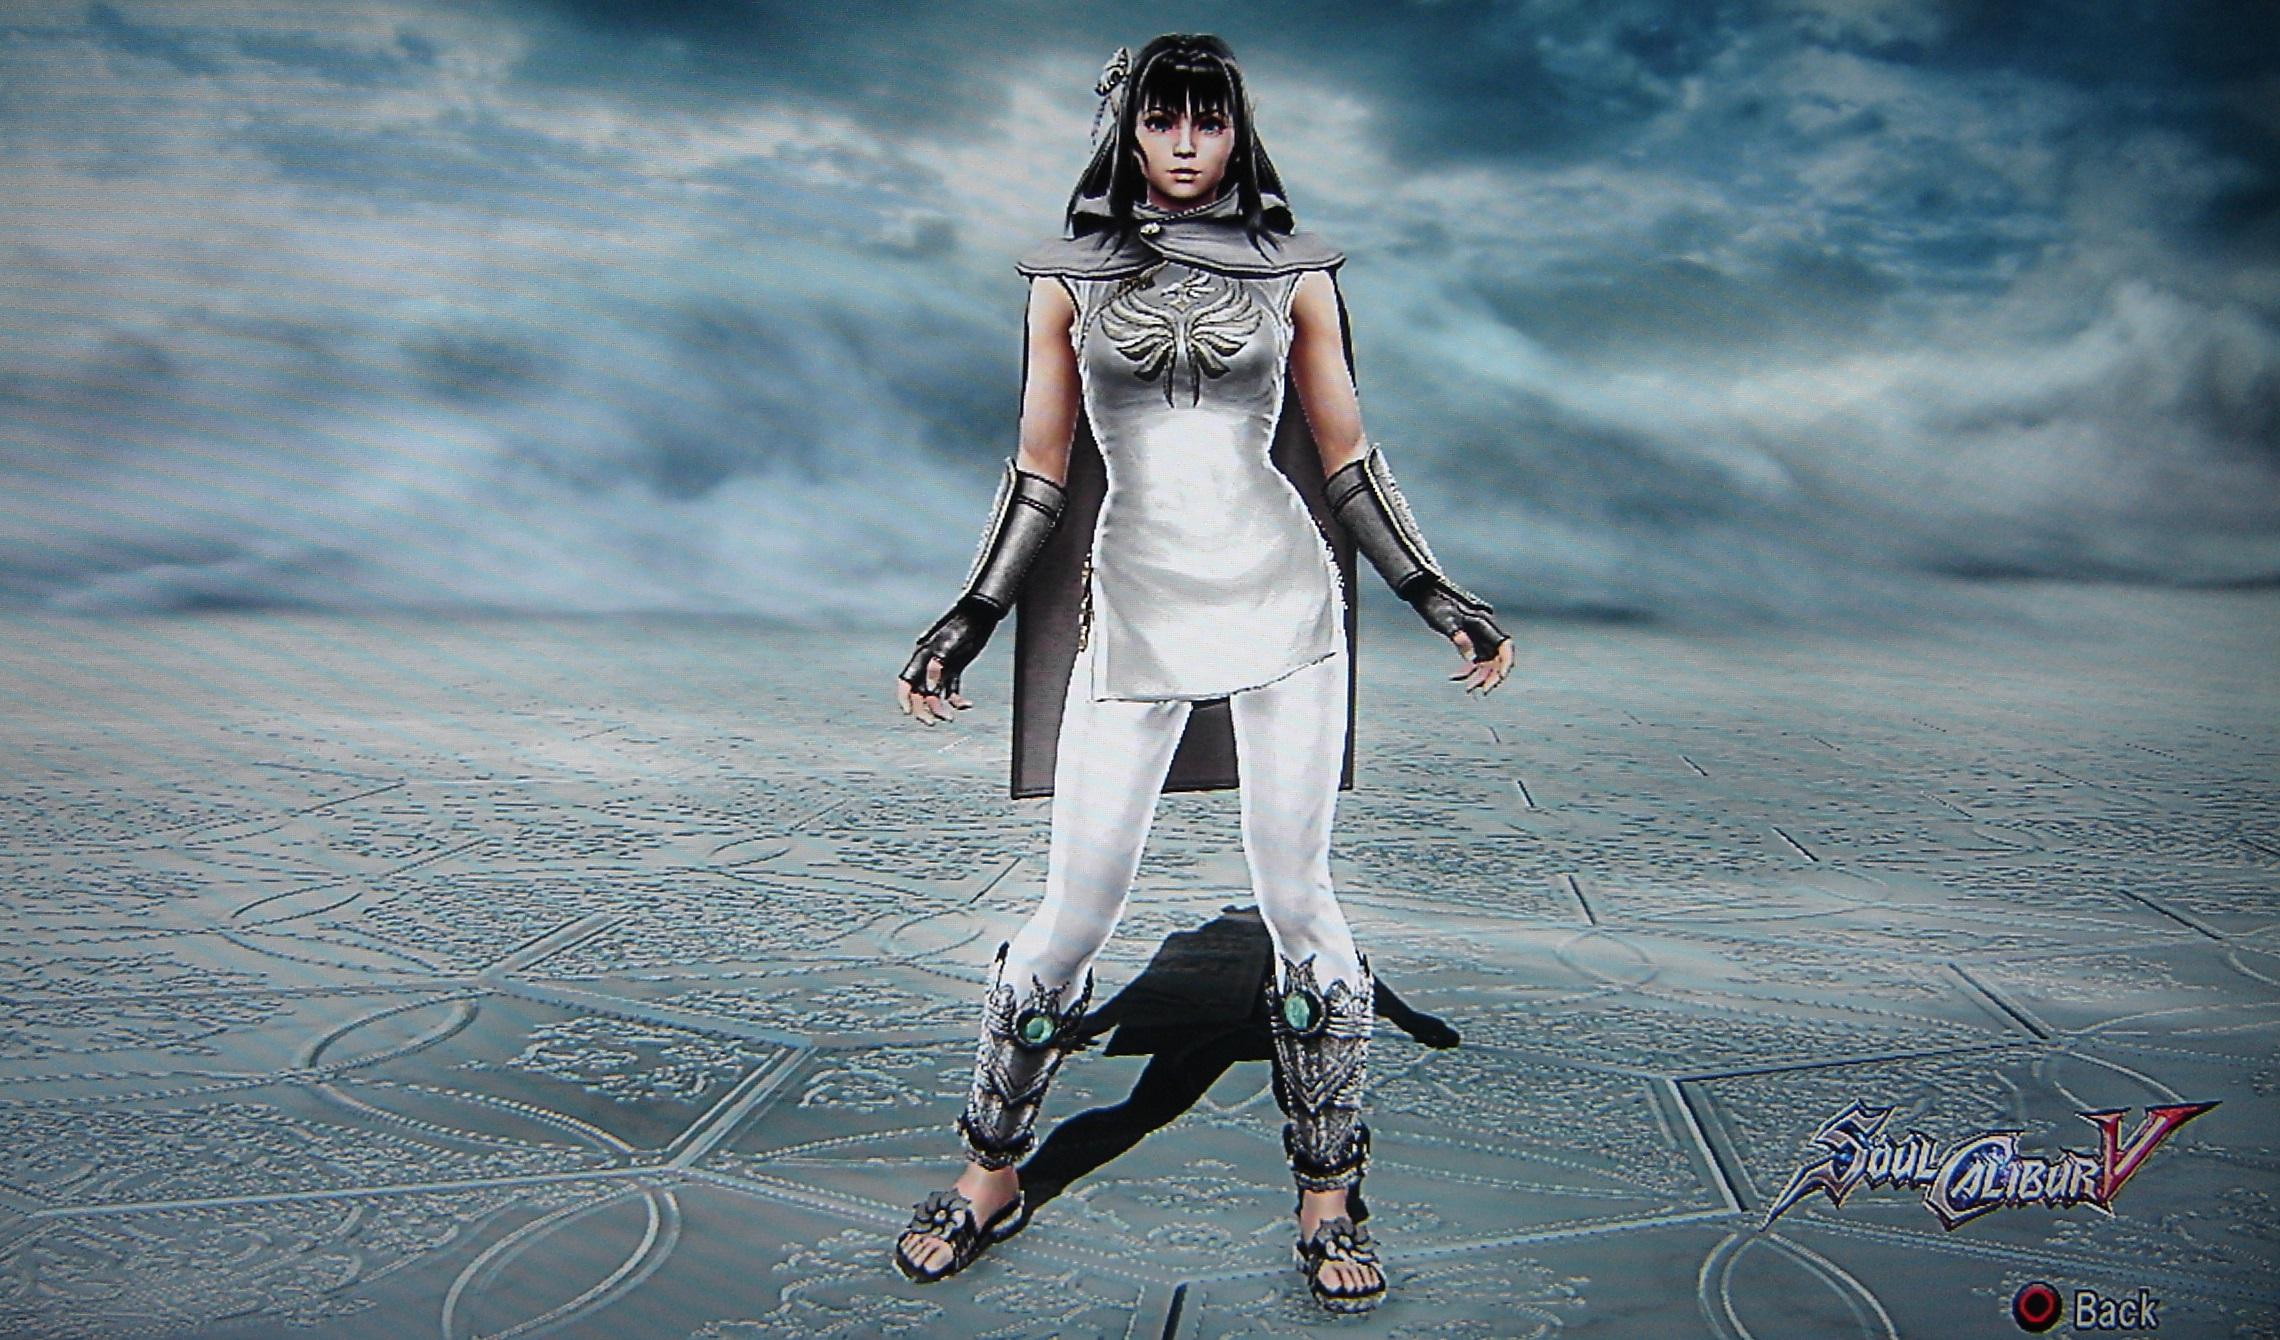 Princess Zera from The Final Power: Chronomancer. Made using Creation mode in Soulcalibur 5. benjaminfrog.com